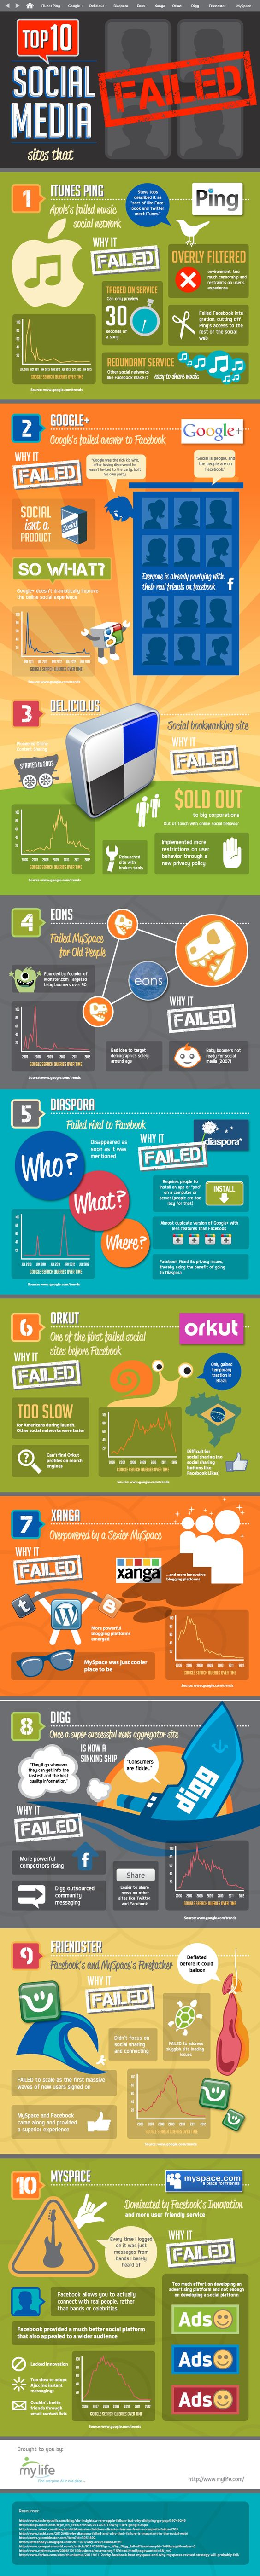 Top 10 sitios del Social Media que han fracasado miserablemente #infografia #infographic #socialmedia